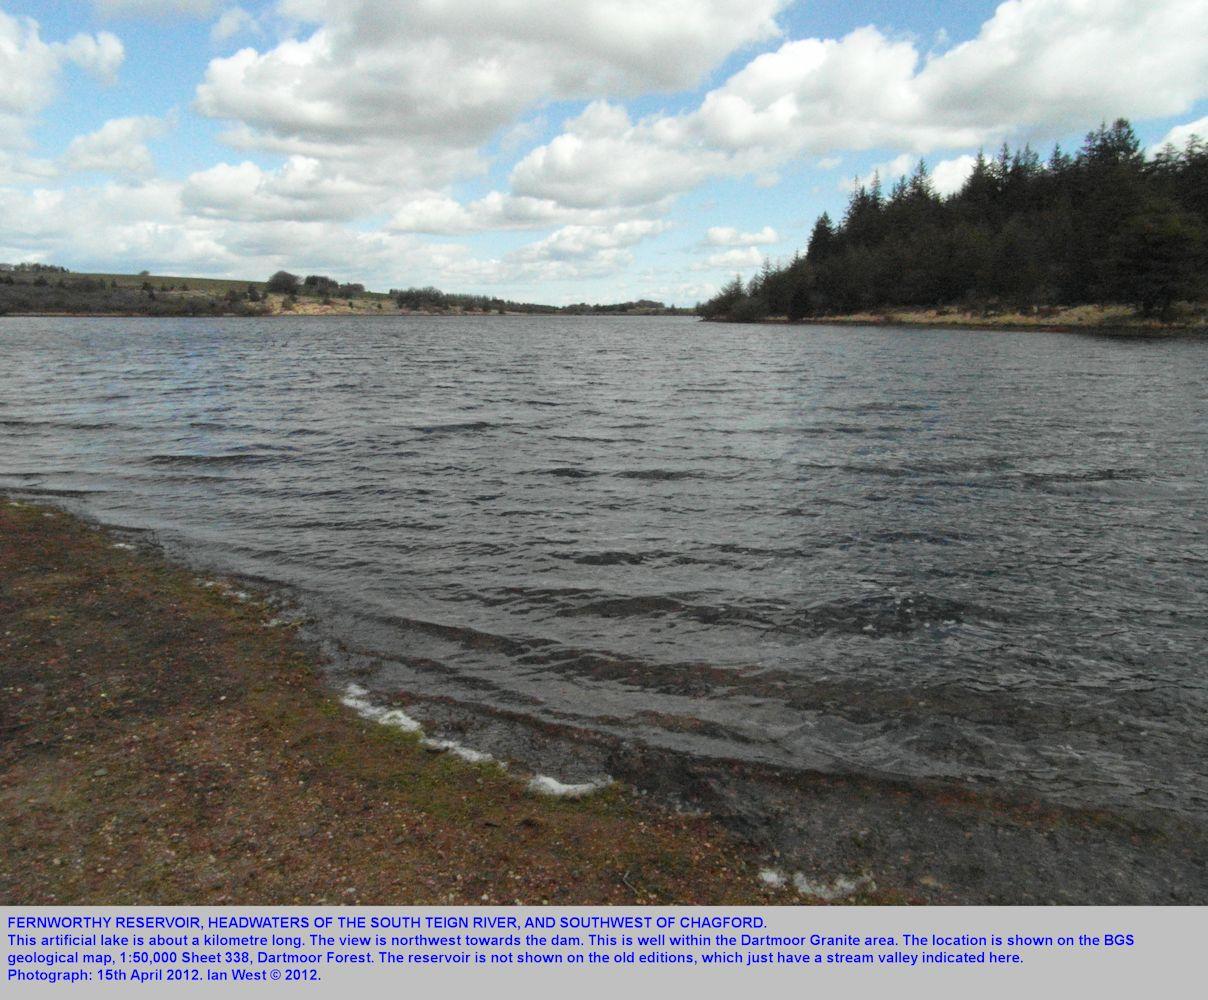 Fernworthy Reservoir on Dartmoor Granite, southwest of Chagford, Dartmoor, Devon, 15th April 2012